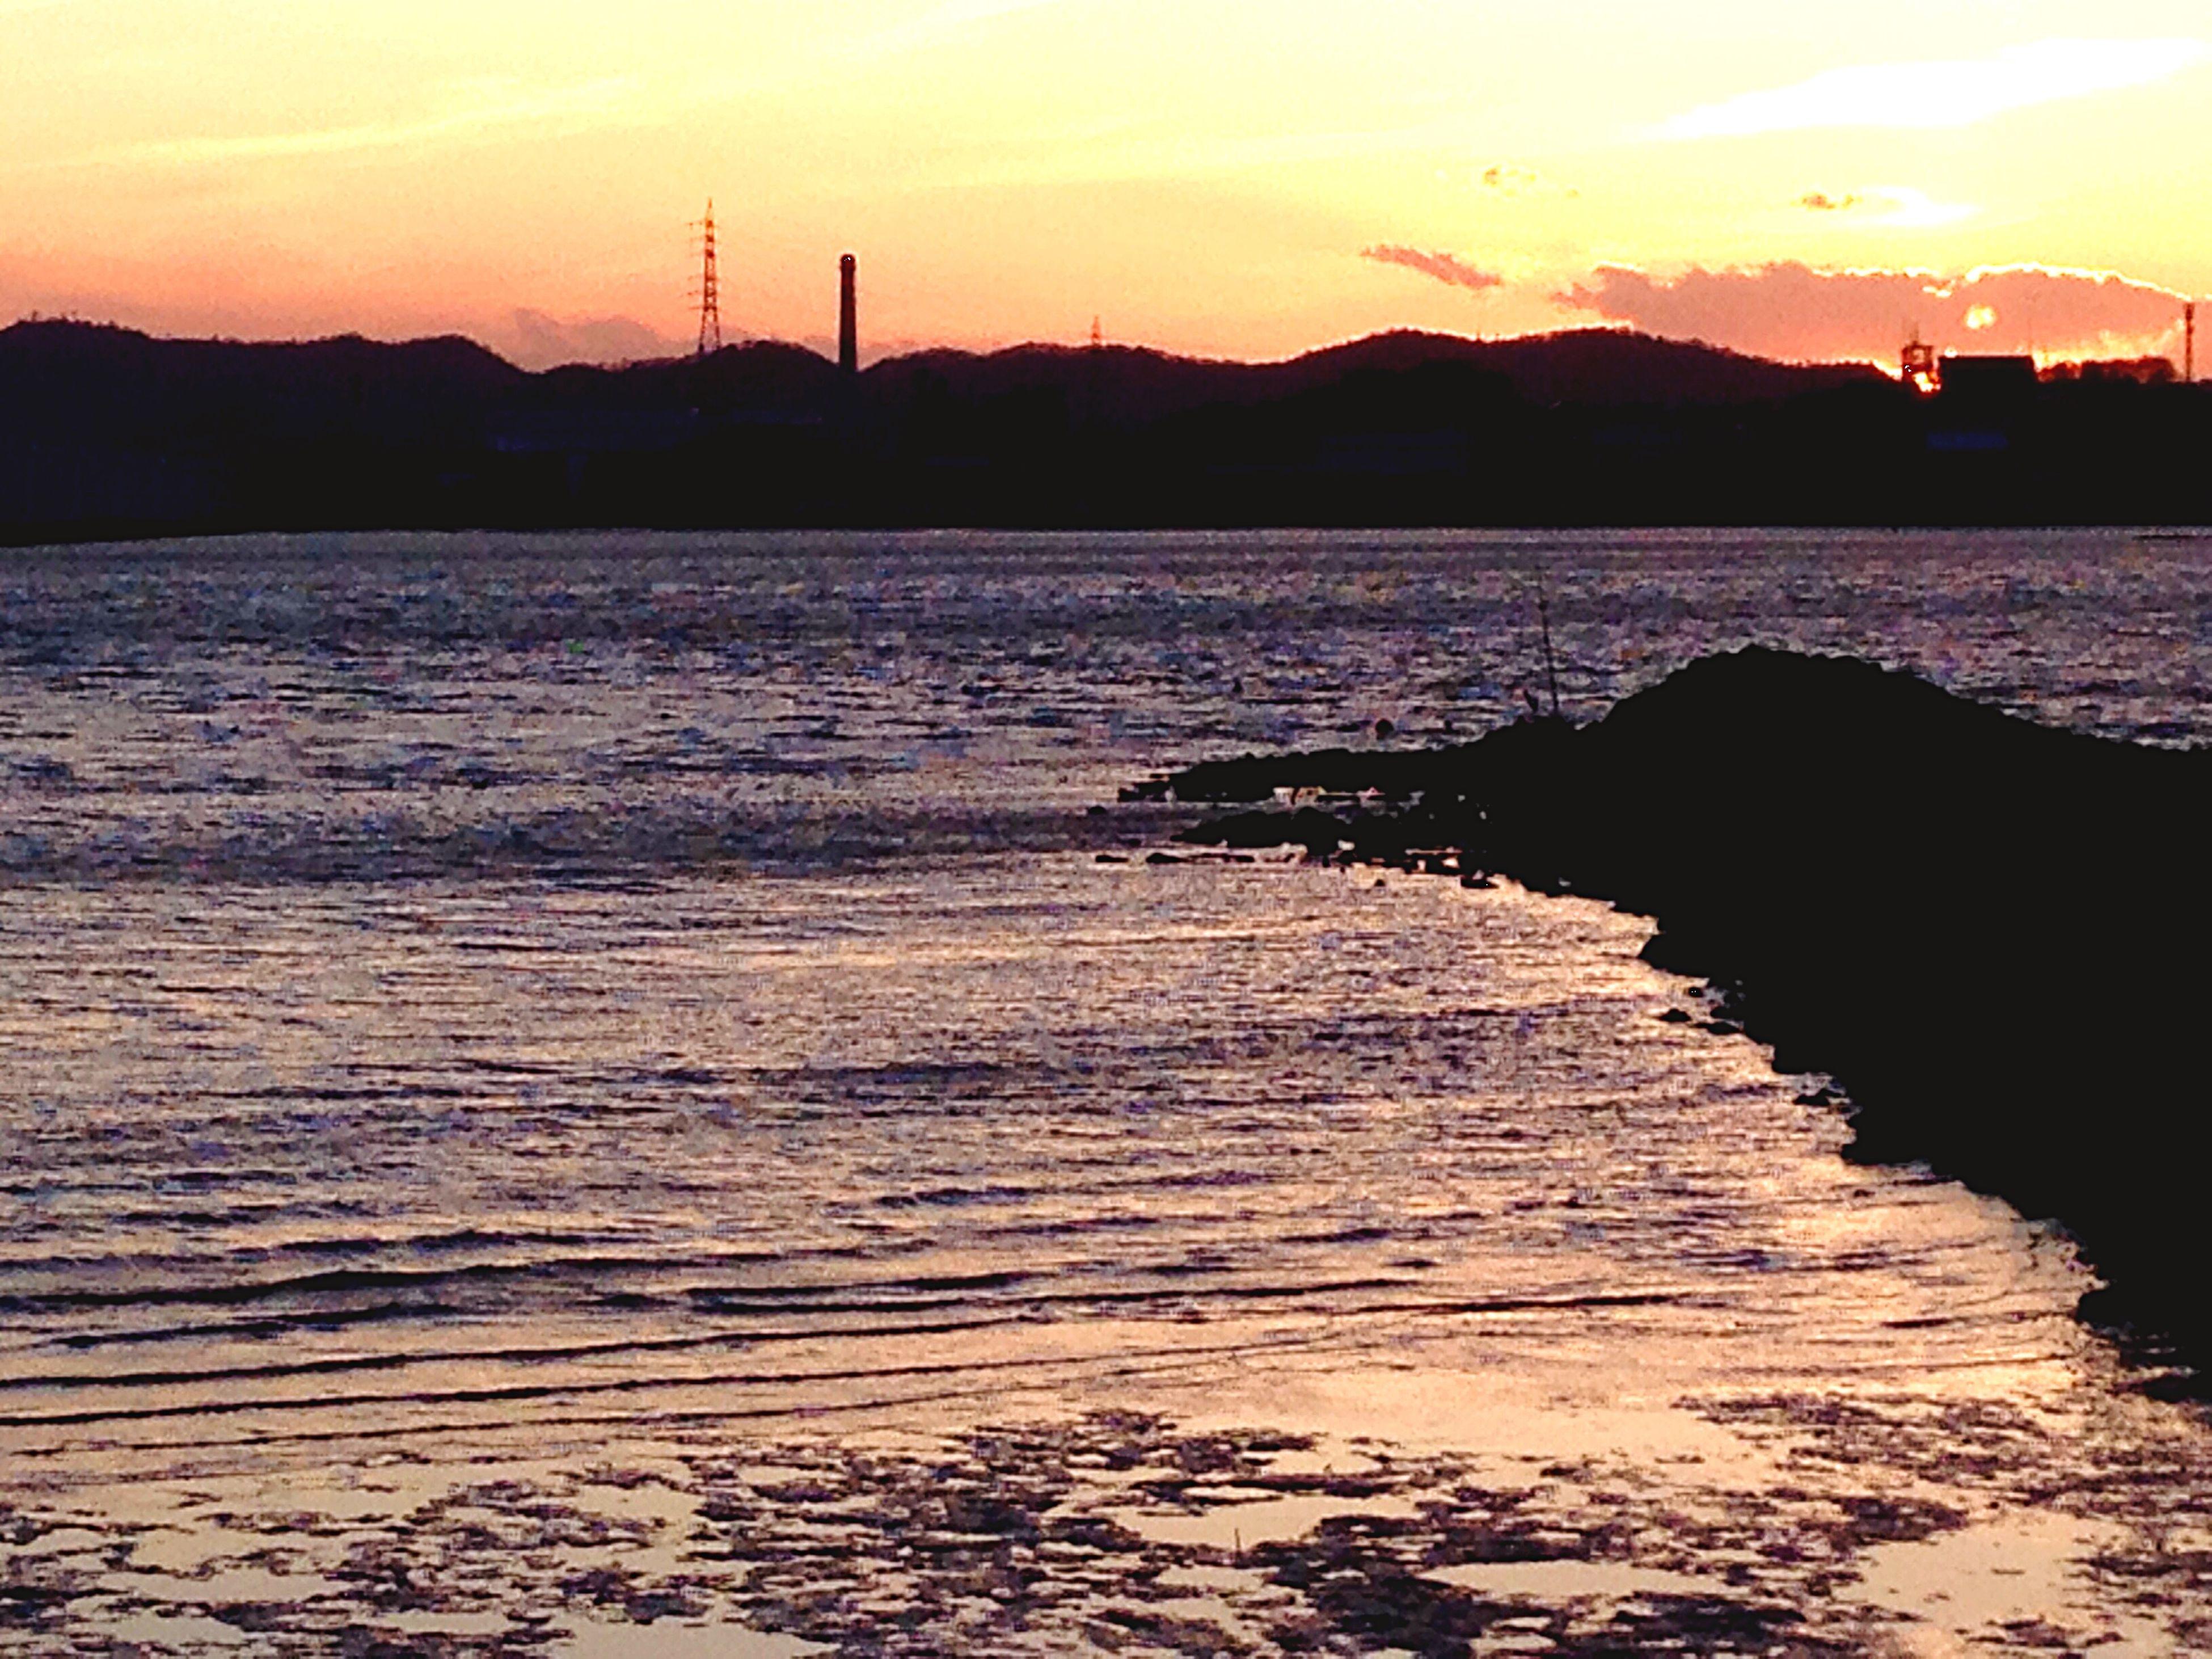 sunset, water, silhouette, tranquil scene, scenics, tranquility, mountain, sky, beauty in nature, sea, nature, reflection, orange color, sun, idyllic, rippled, lake, pier, dusk, mountain range